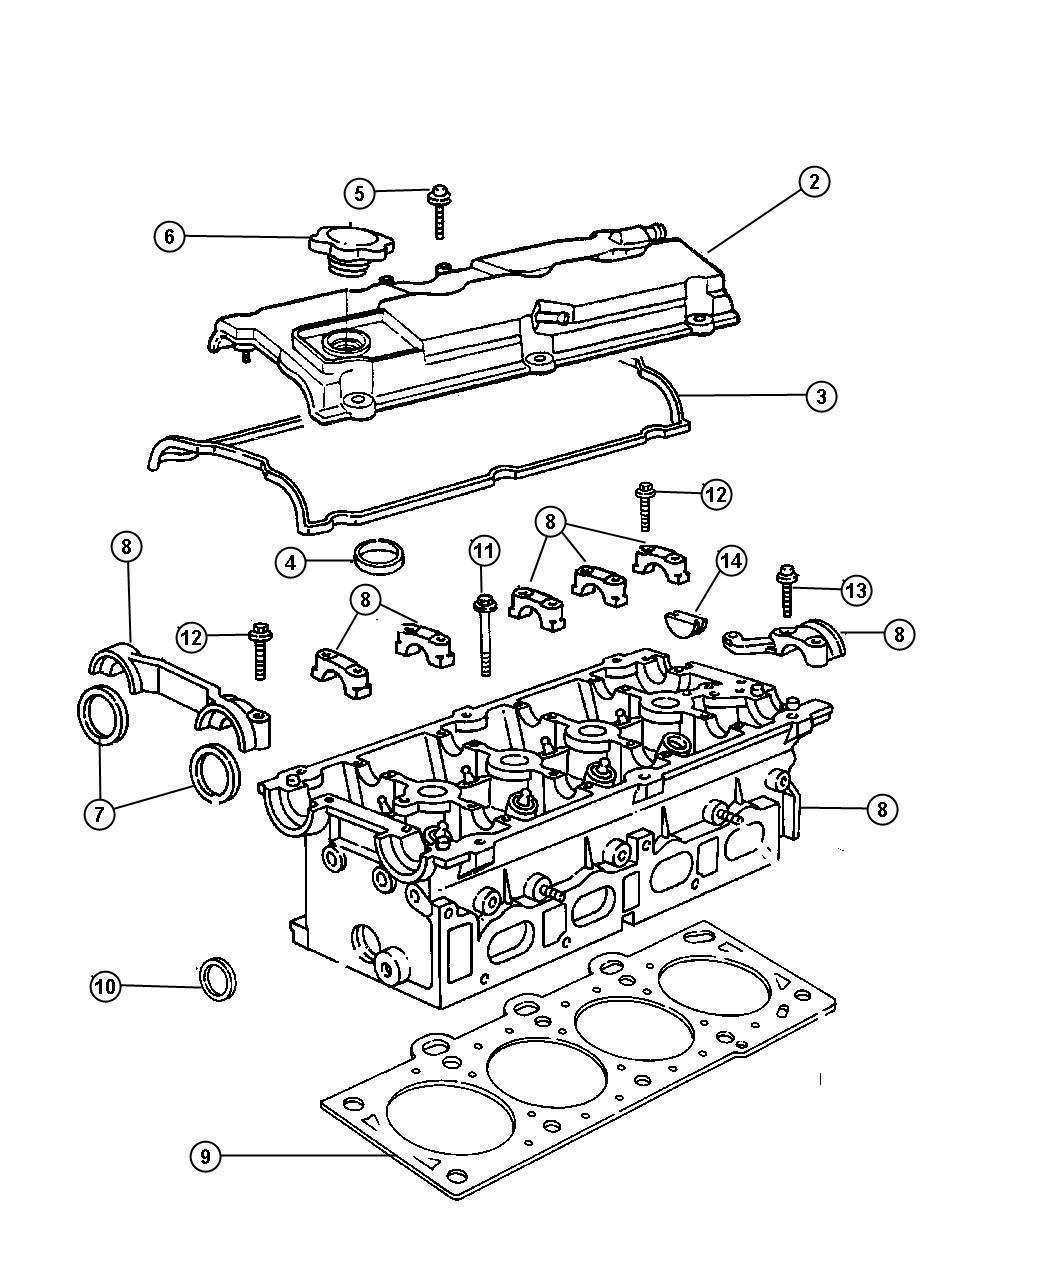 Dodge Stratus Gasket. Cylinder head cover, valve cover